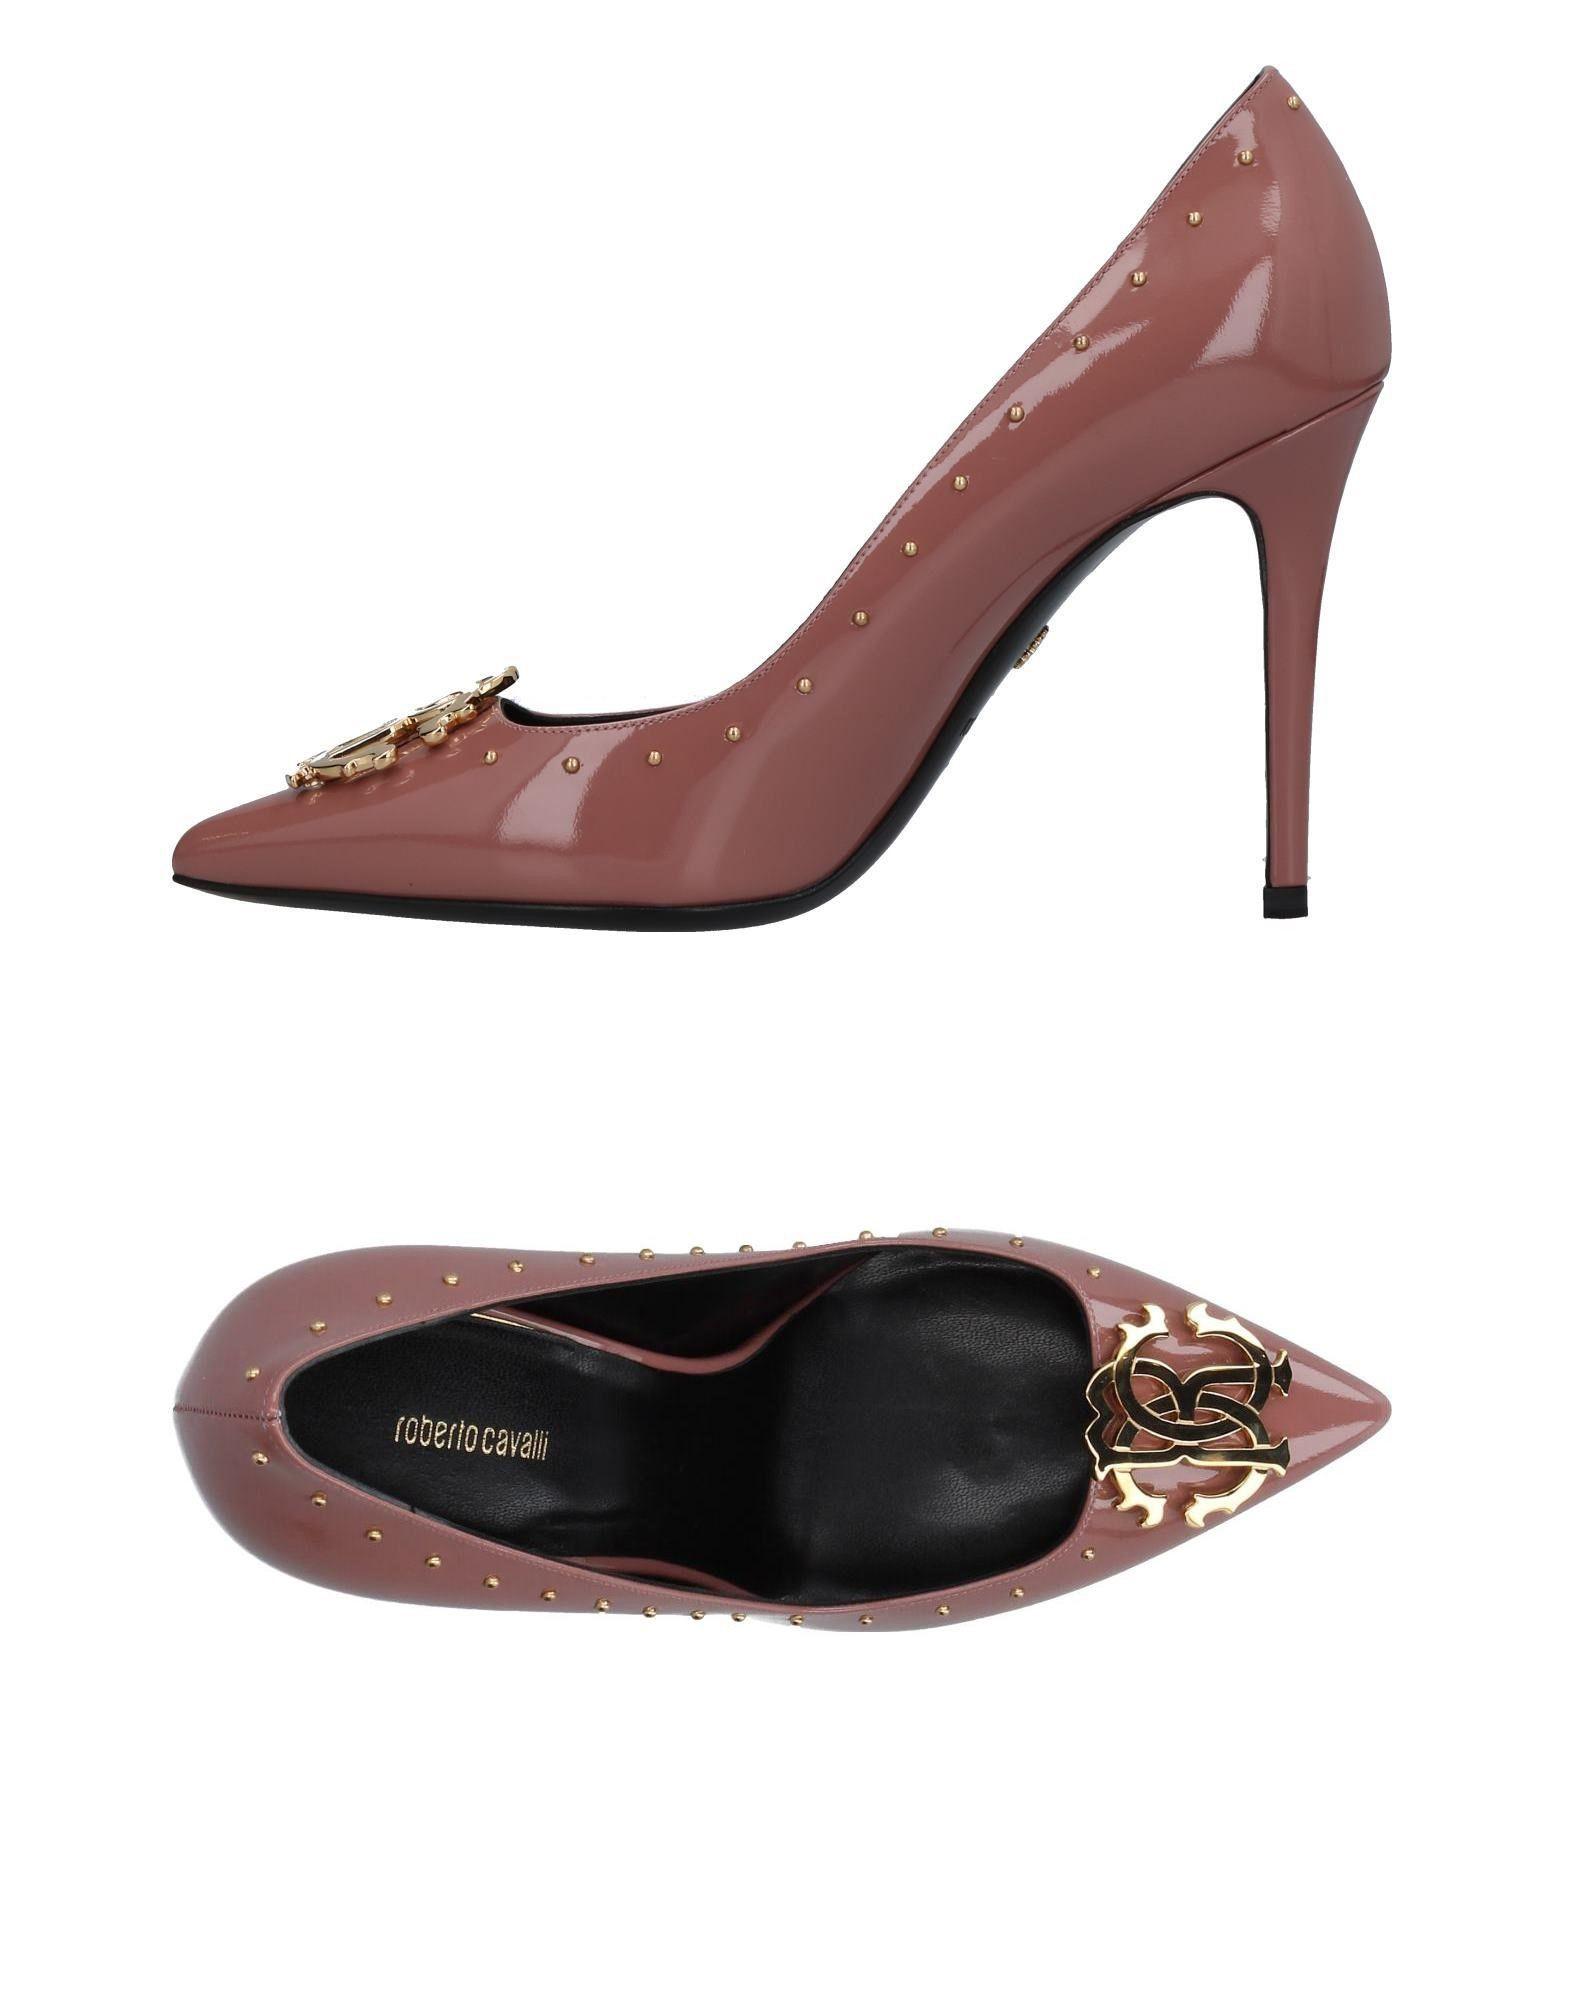 Rabatt Schuhe Roberto Cavalli Pumps Damen  11393834HT